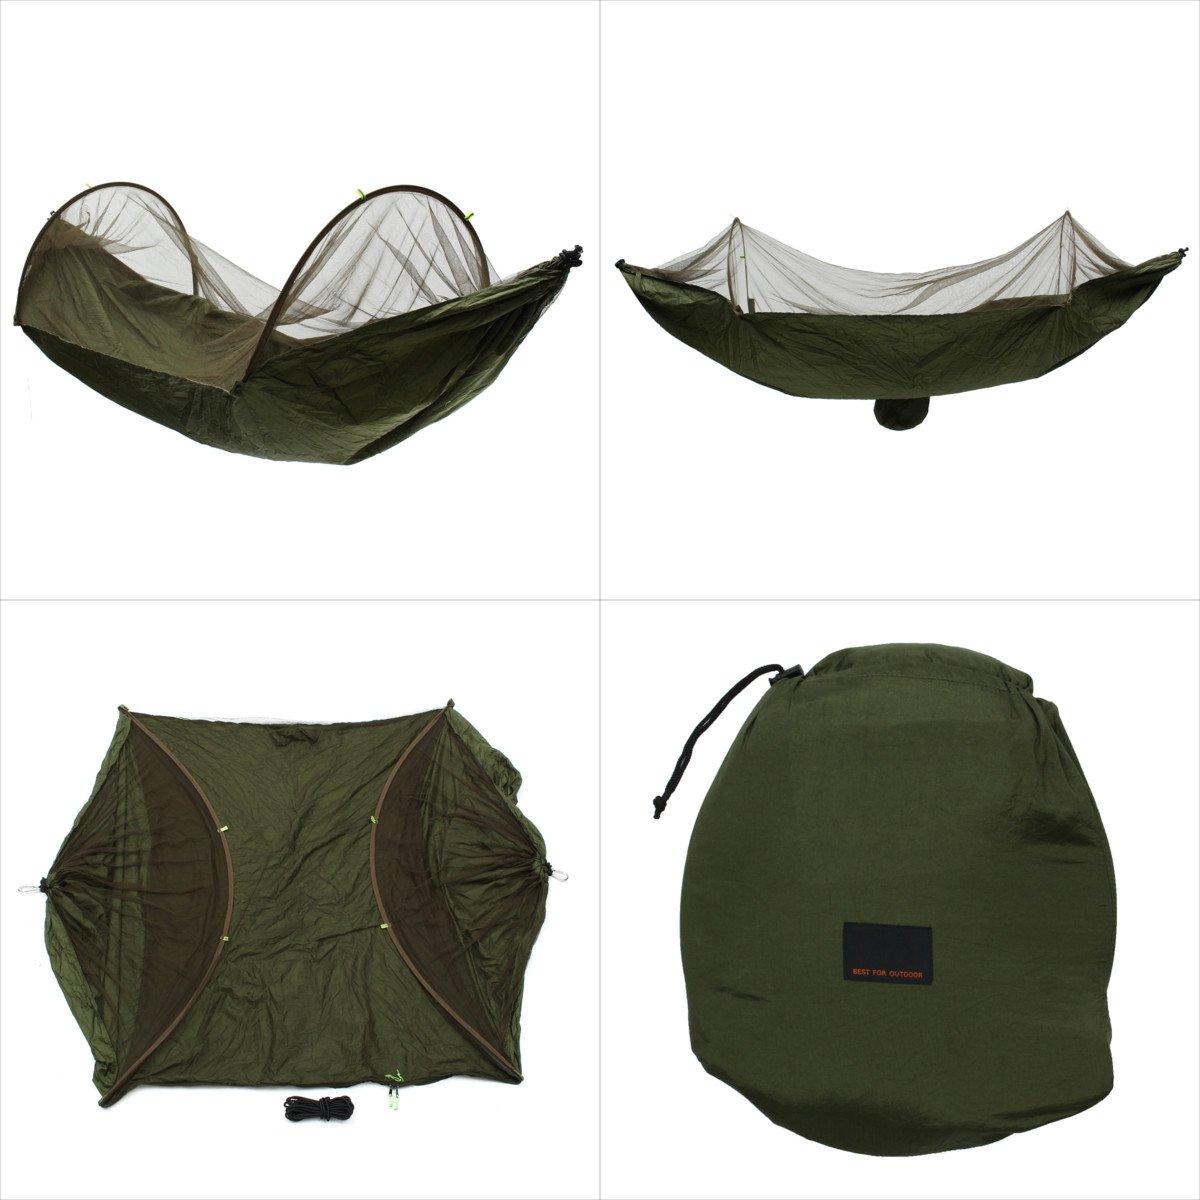 LaDicha 290X145Cm Durable Al Aire Libre Camping Colgante ...